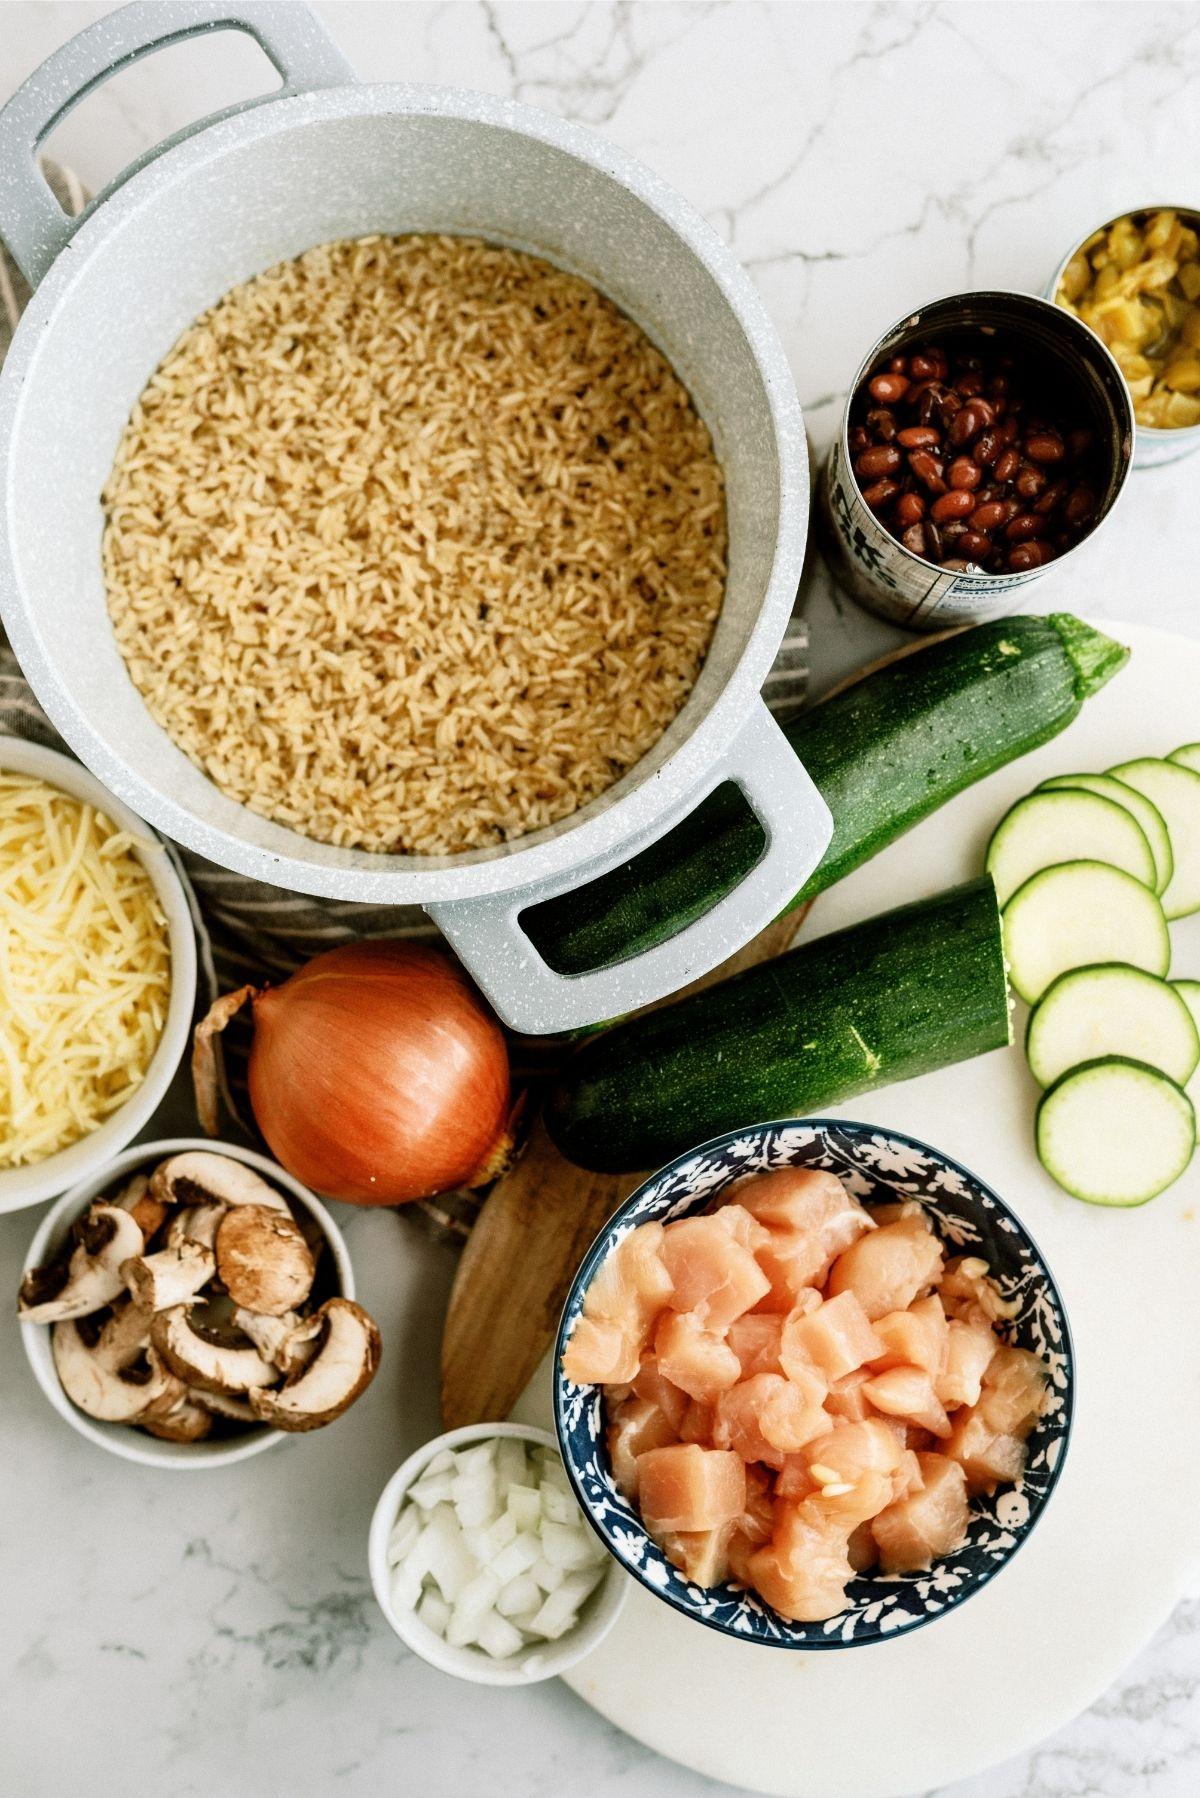 Ingredients for Chicken and Black Bean Casserole